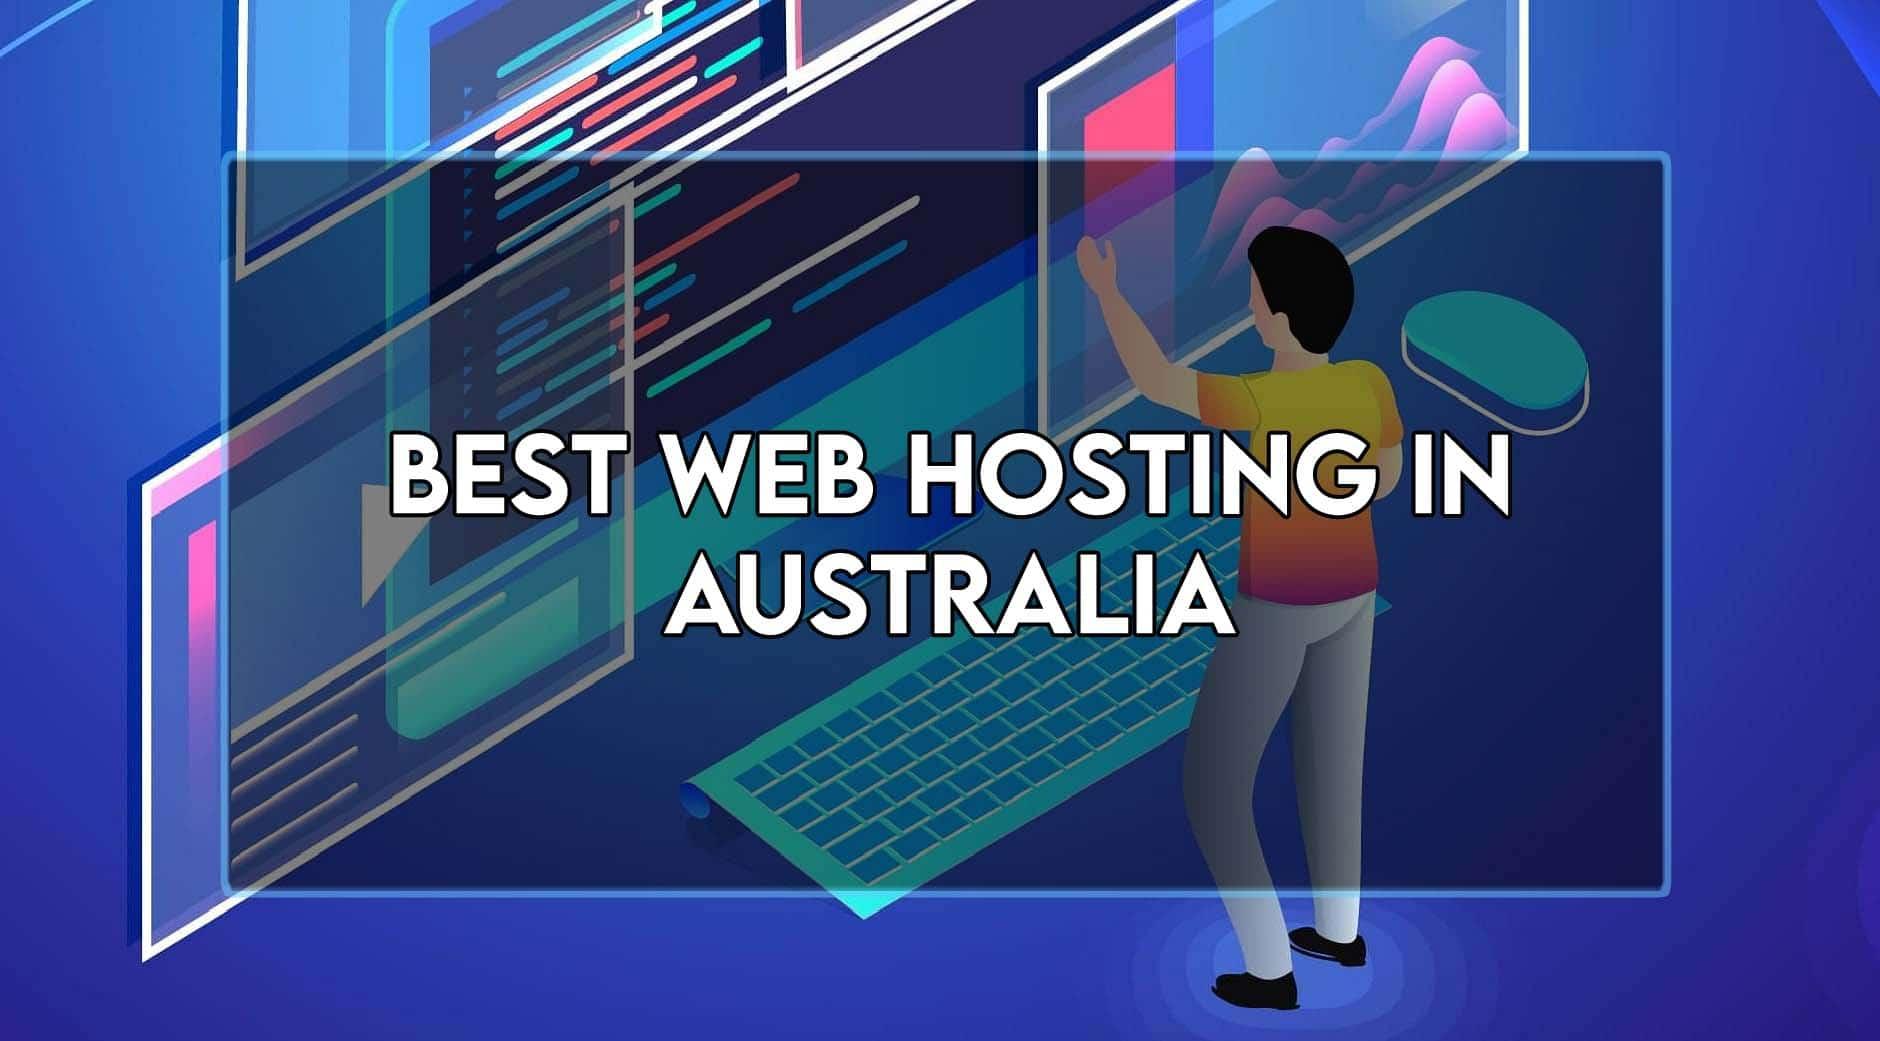 Best web hosting in australia